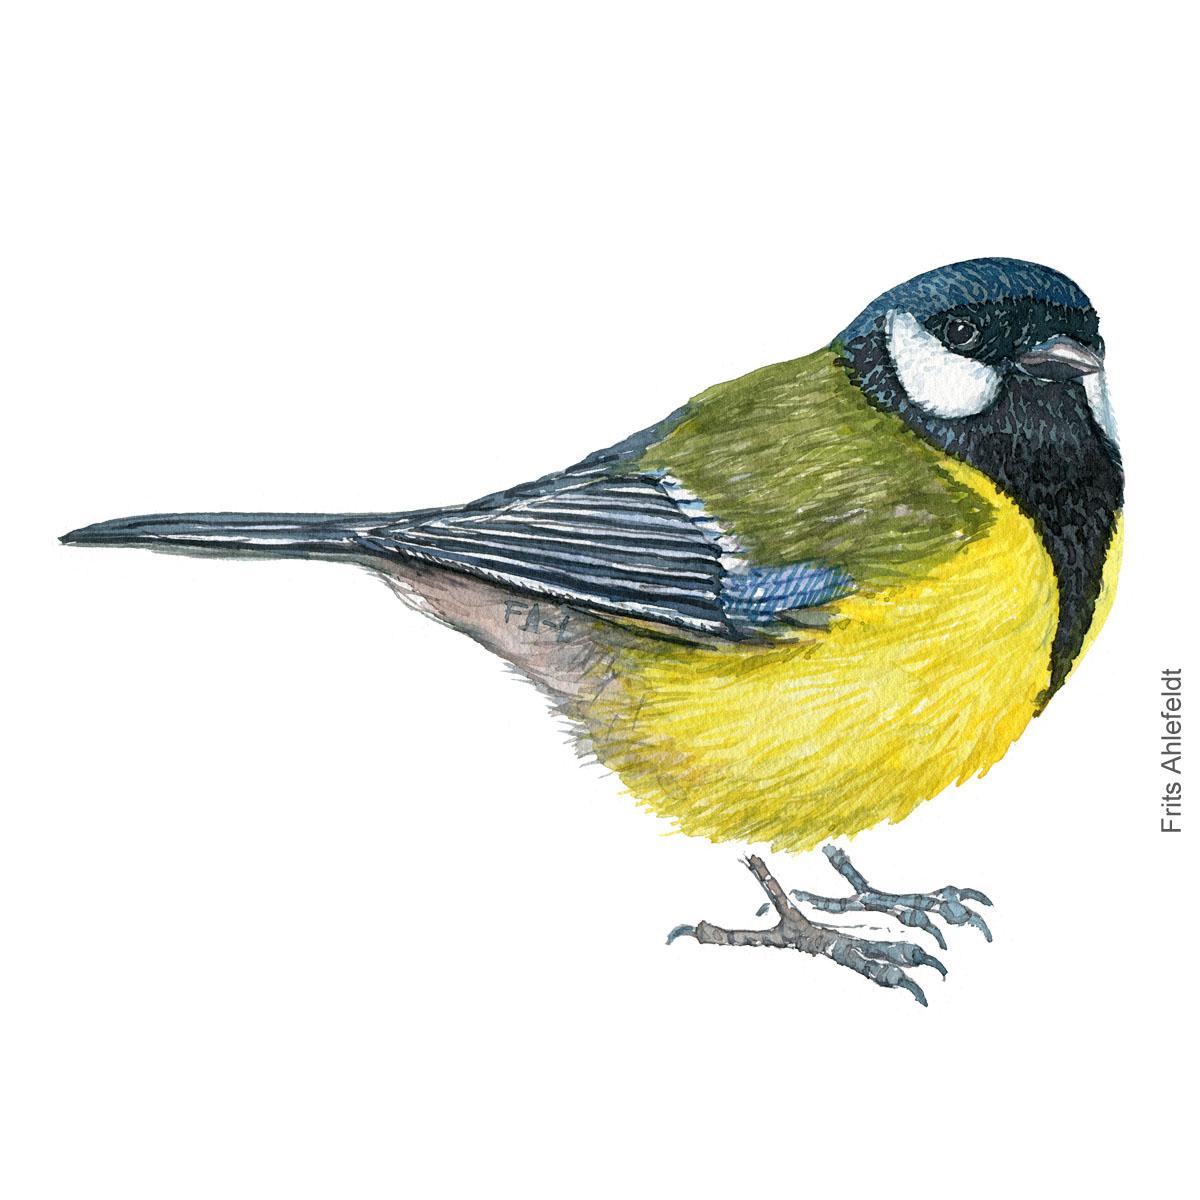 Musvit - Great tit bird watercolor illustration. Painting by Frits Ahlefeldt. Fugle akvarel